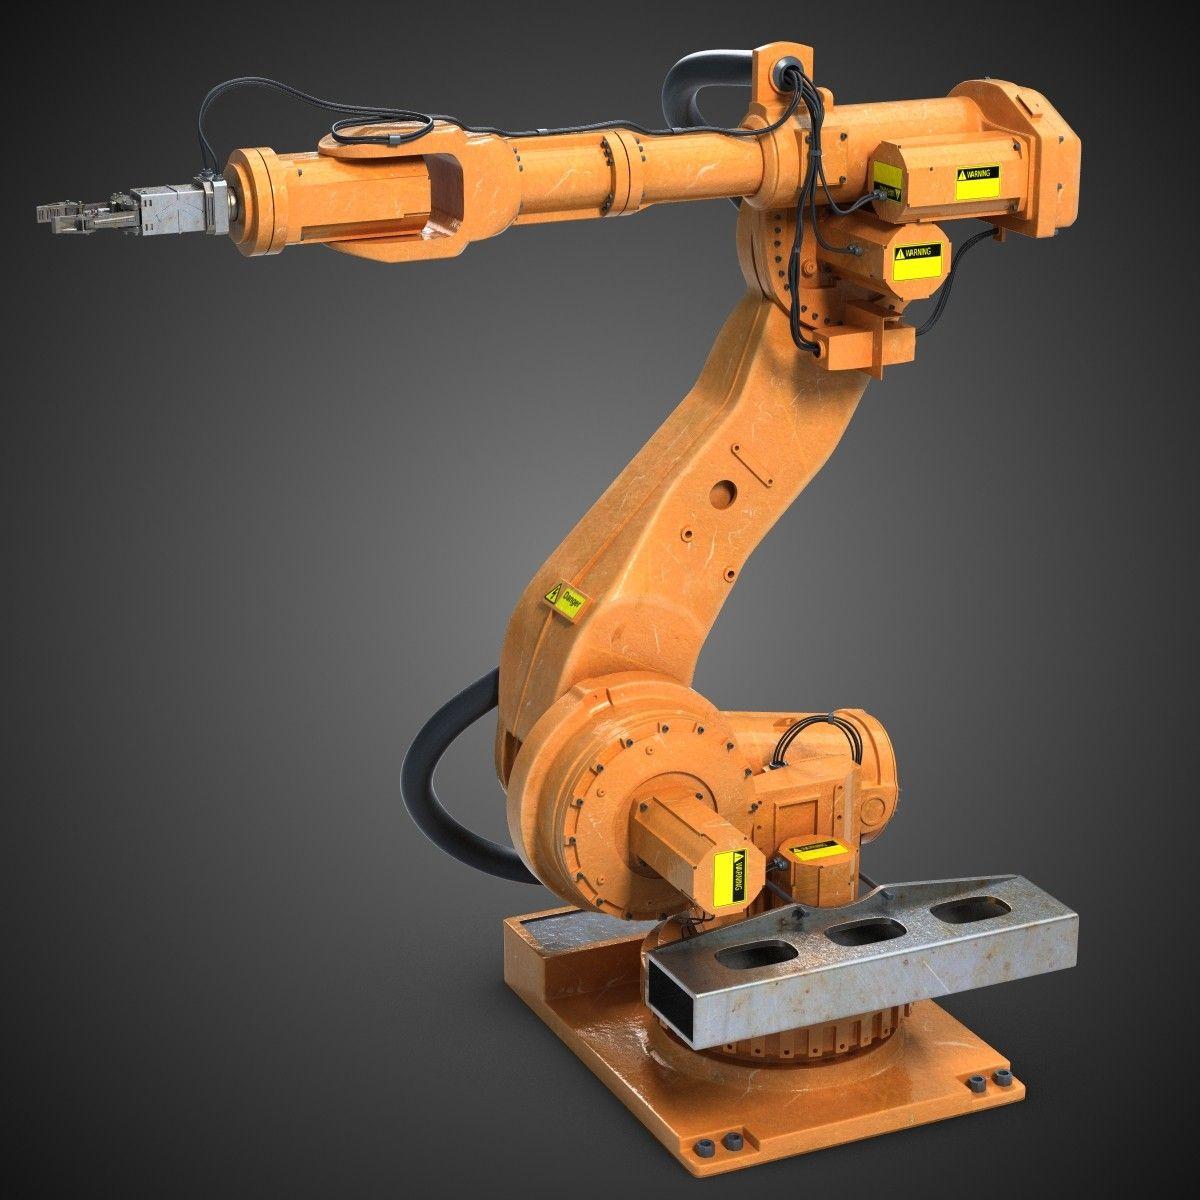 a2ff4cf1cdc79295412544dc3d6b3065 abb robotics industrial robot irb 1200 industrial robots  at gsmx.co